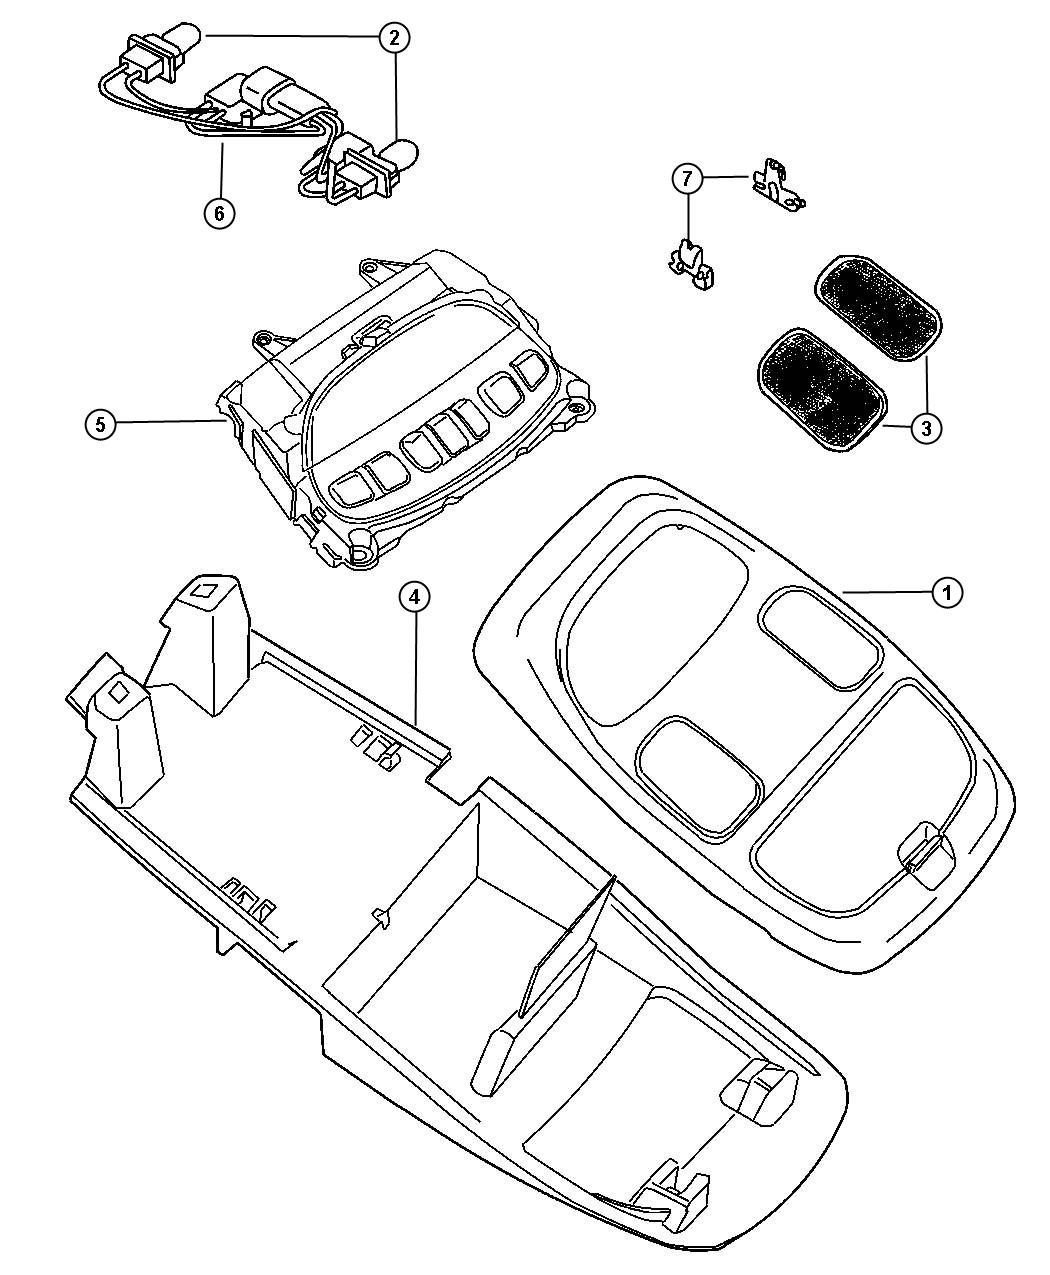 Dodge Ram 1500 Wiring. Overhead console. Trim: [all trim